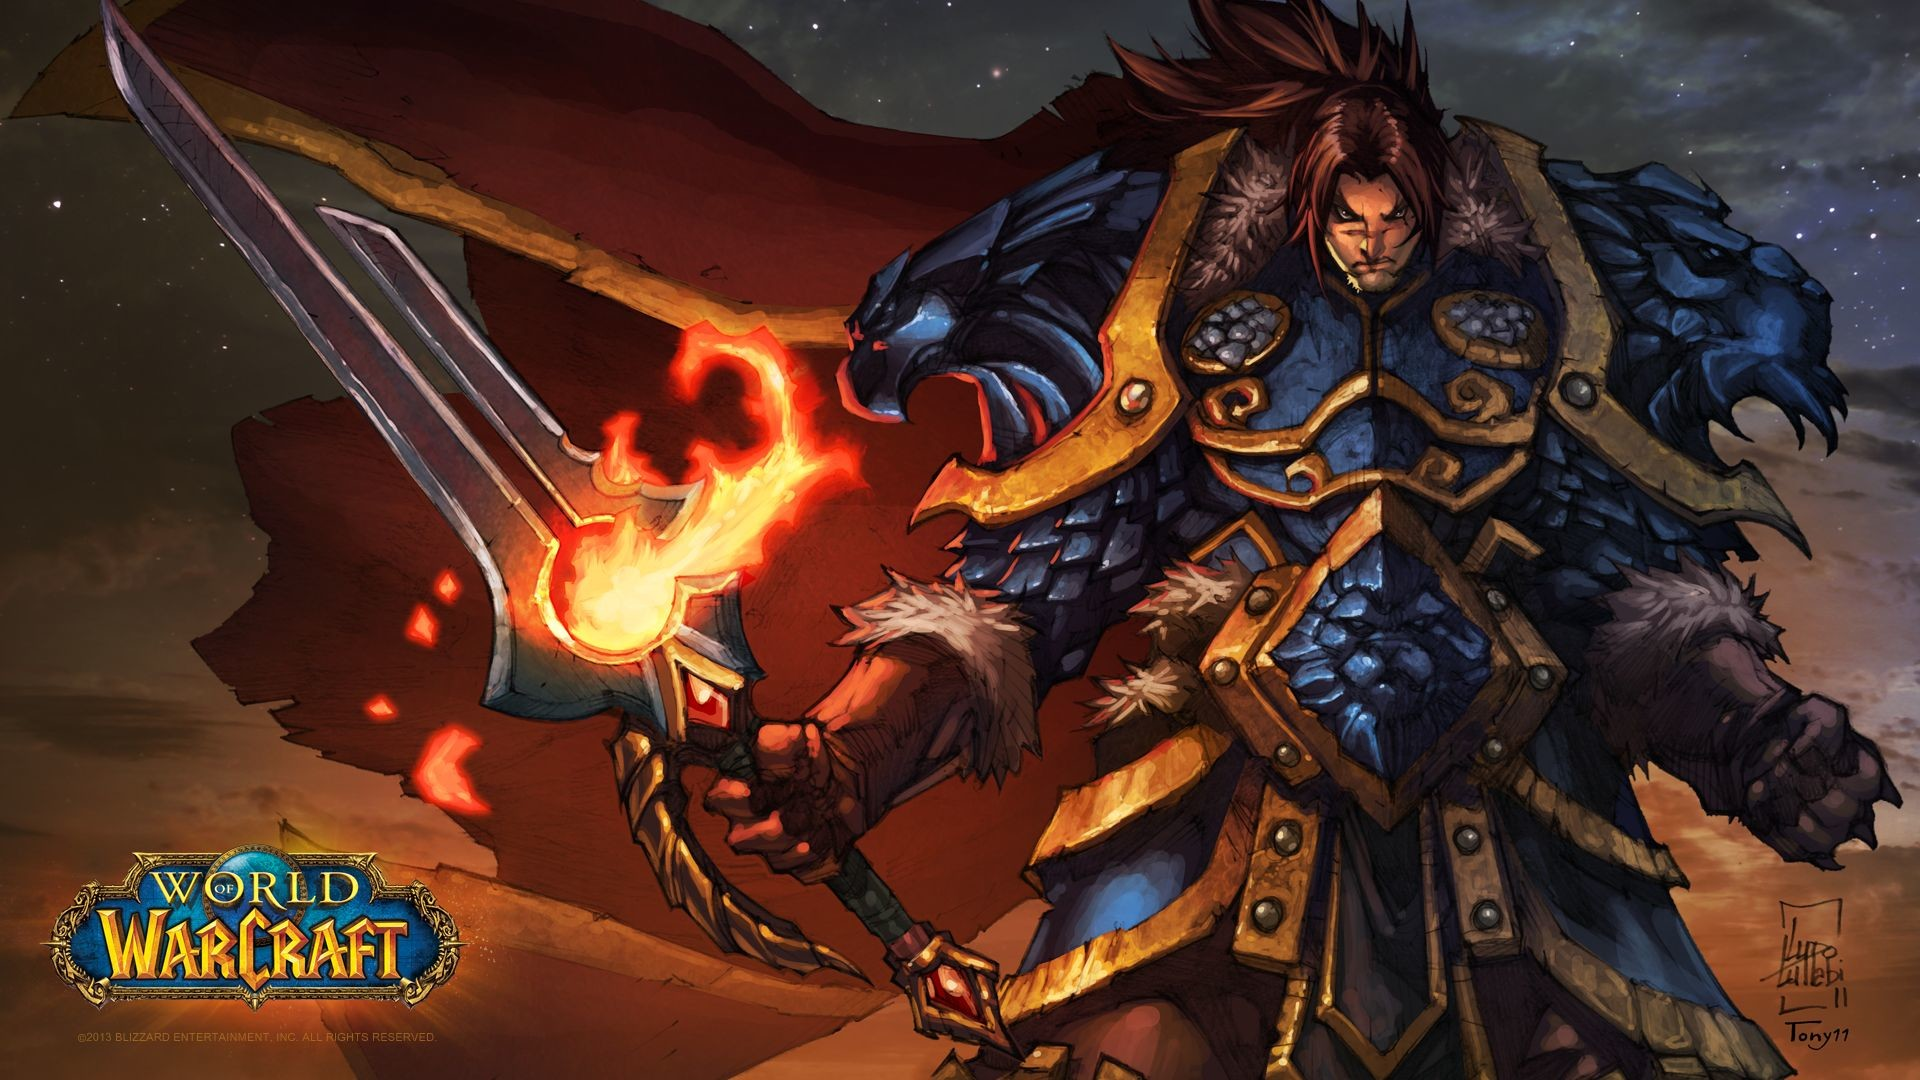 Wallpaper world of warcraft, hero, wow